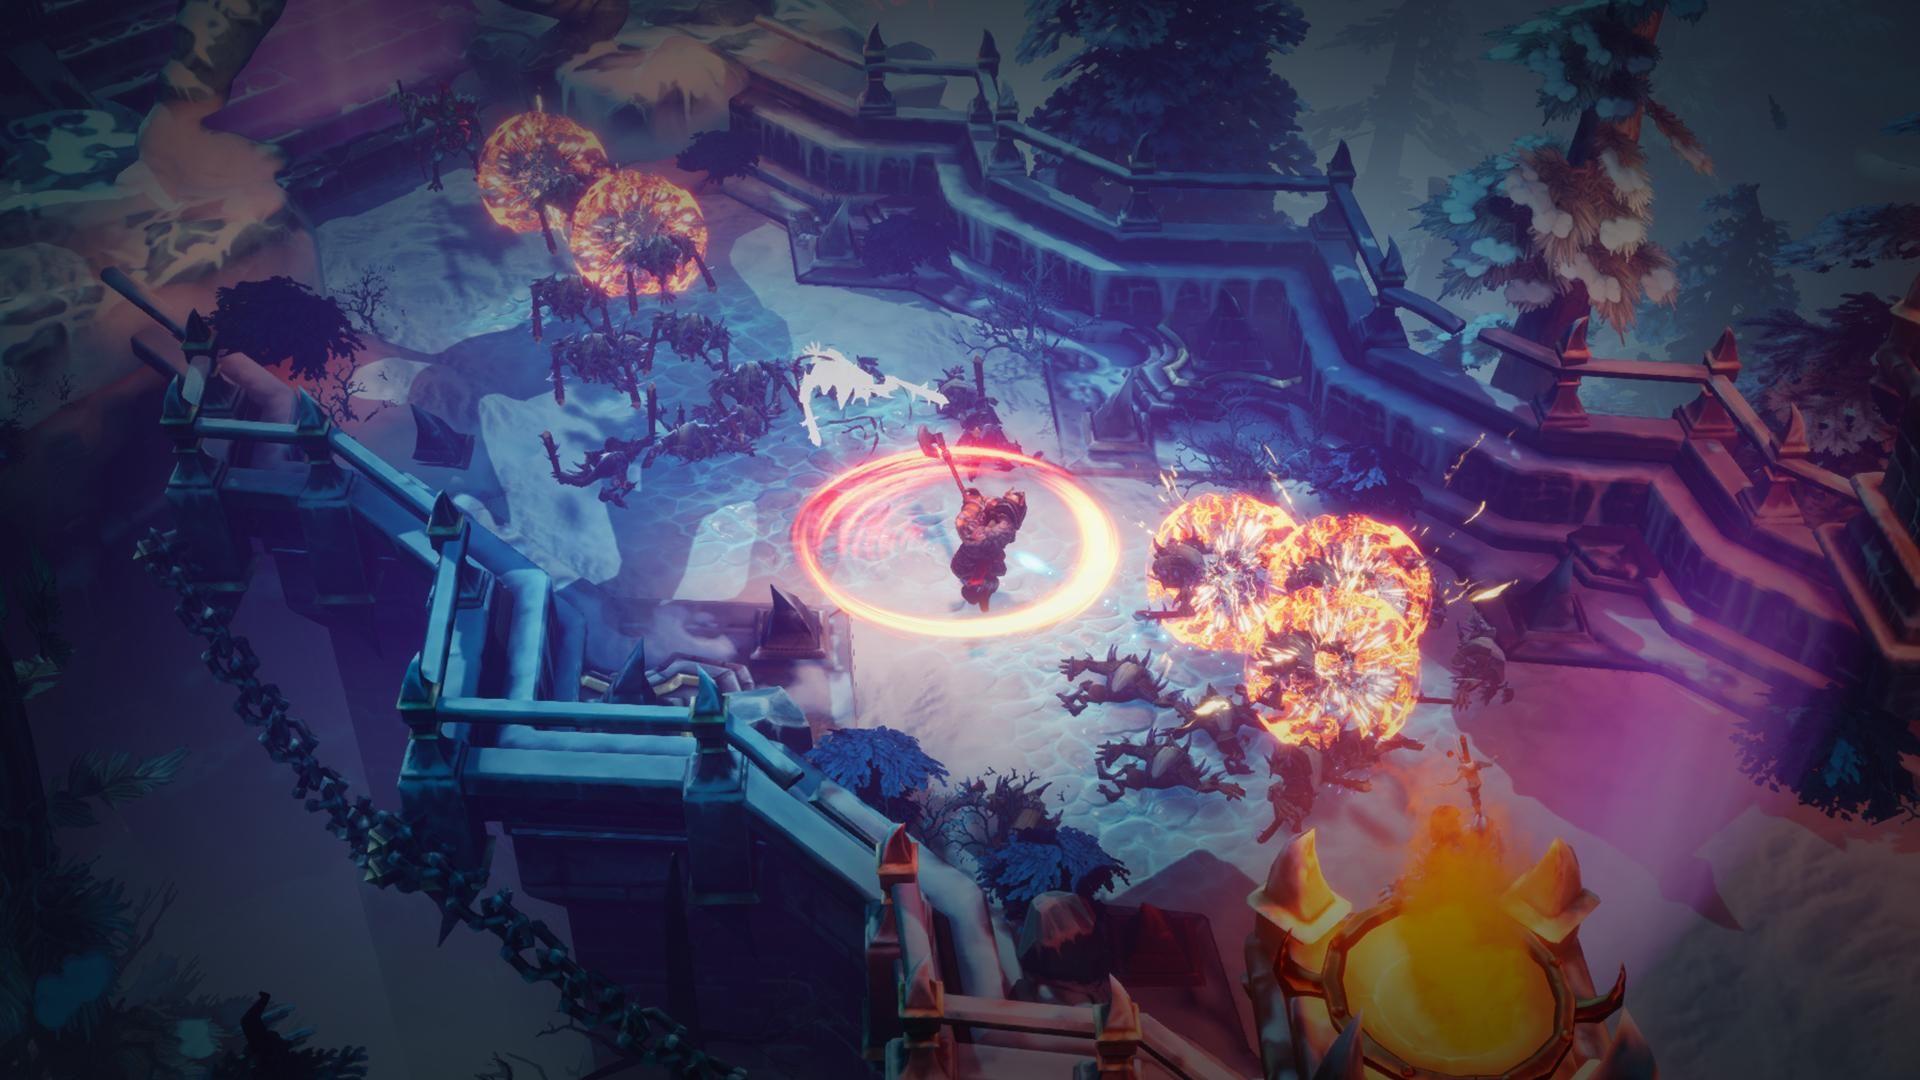 Diablo Like Games 2020.Top 10 Upcoming Diablo Like Hack And Slash Games Mmogames Com